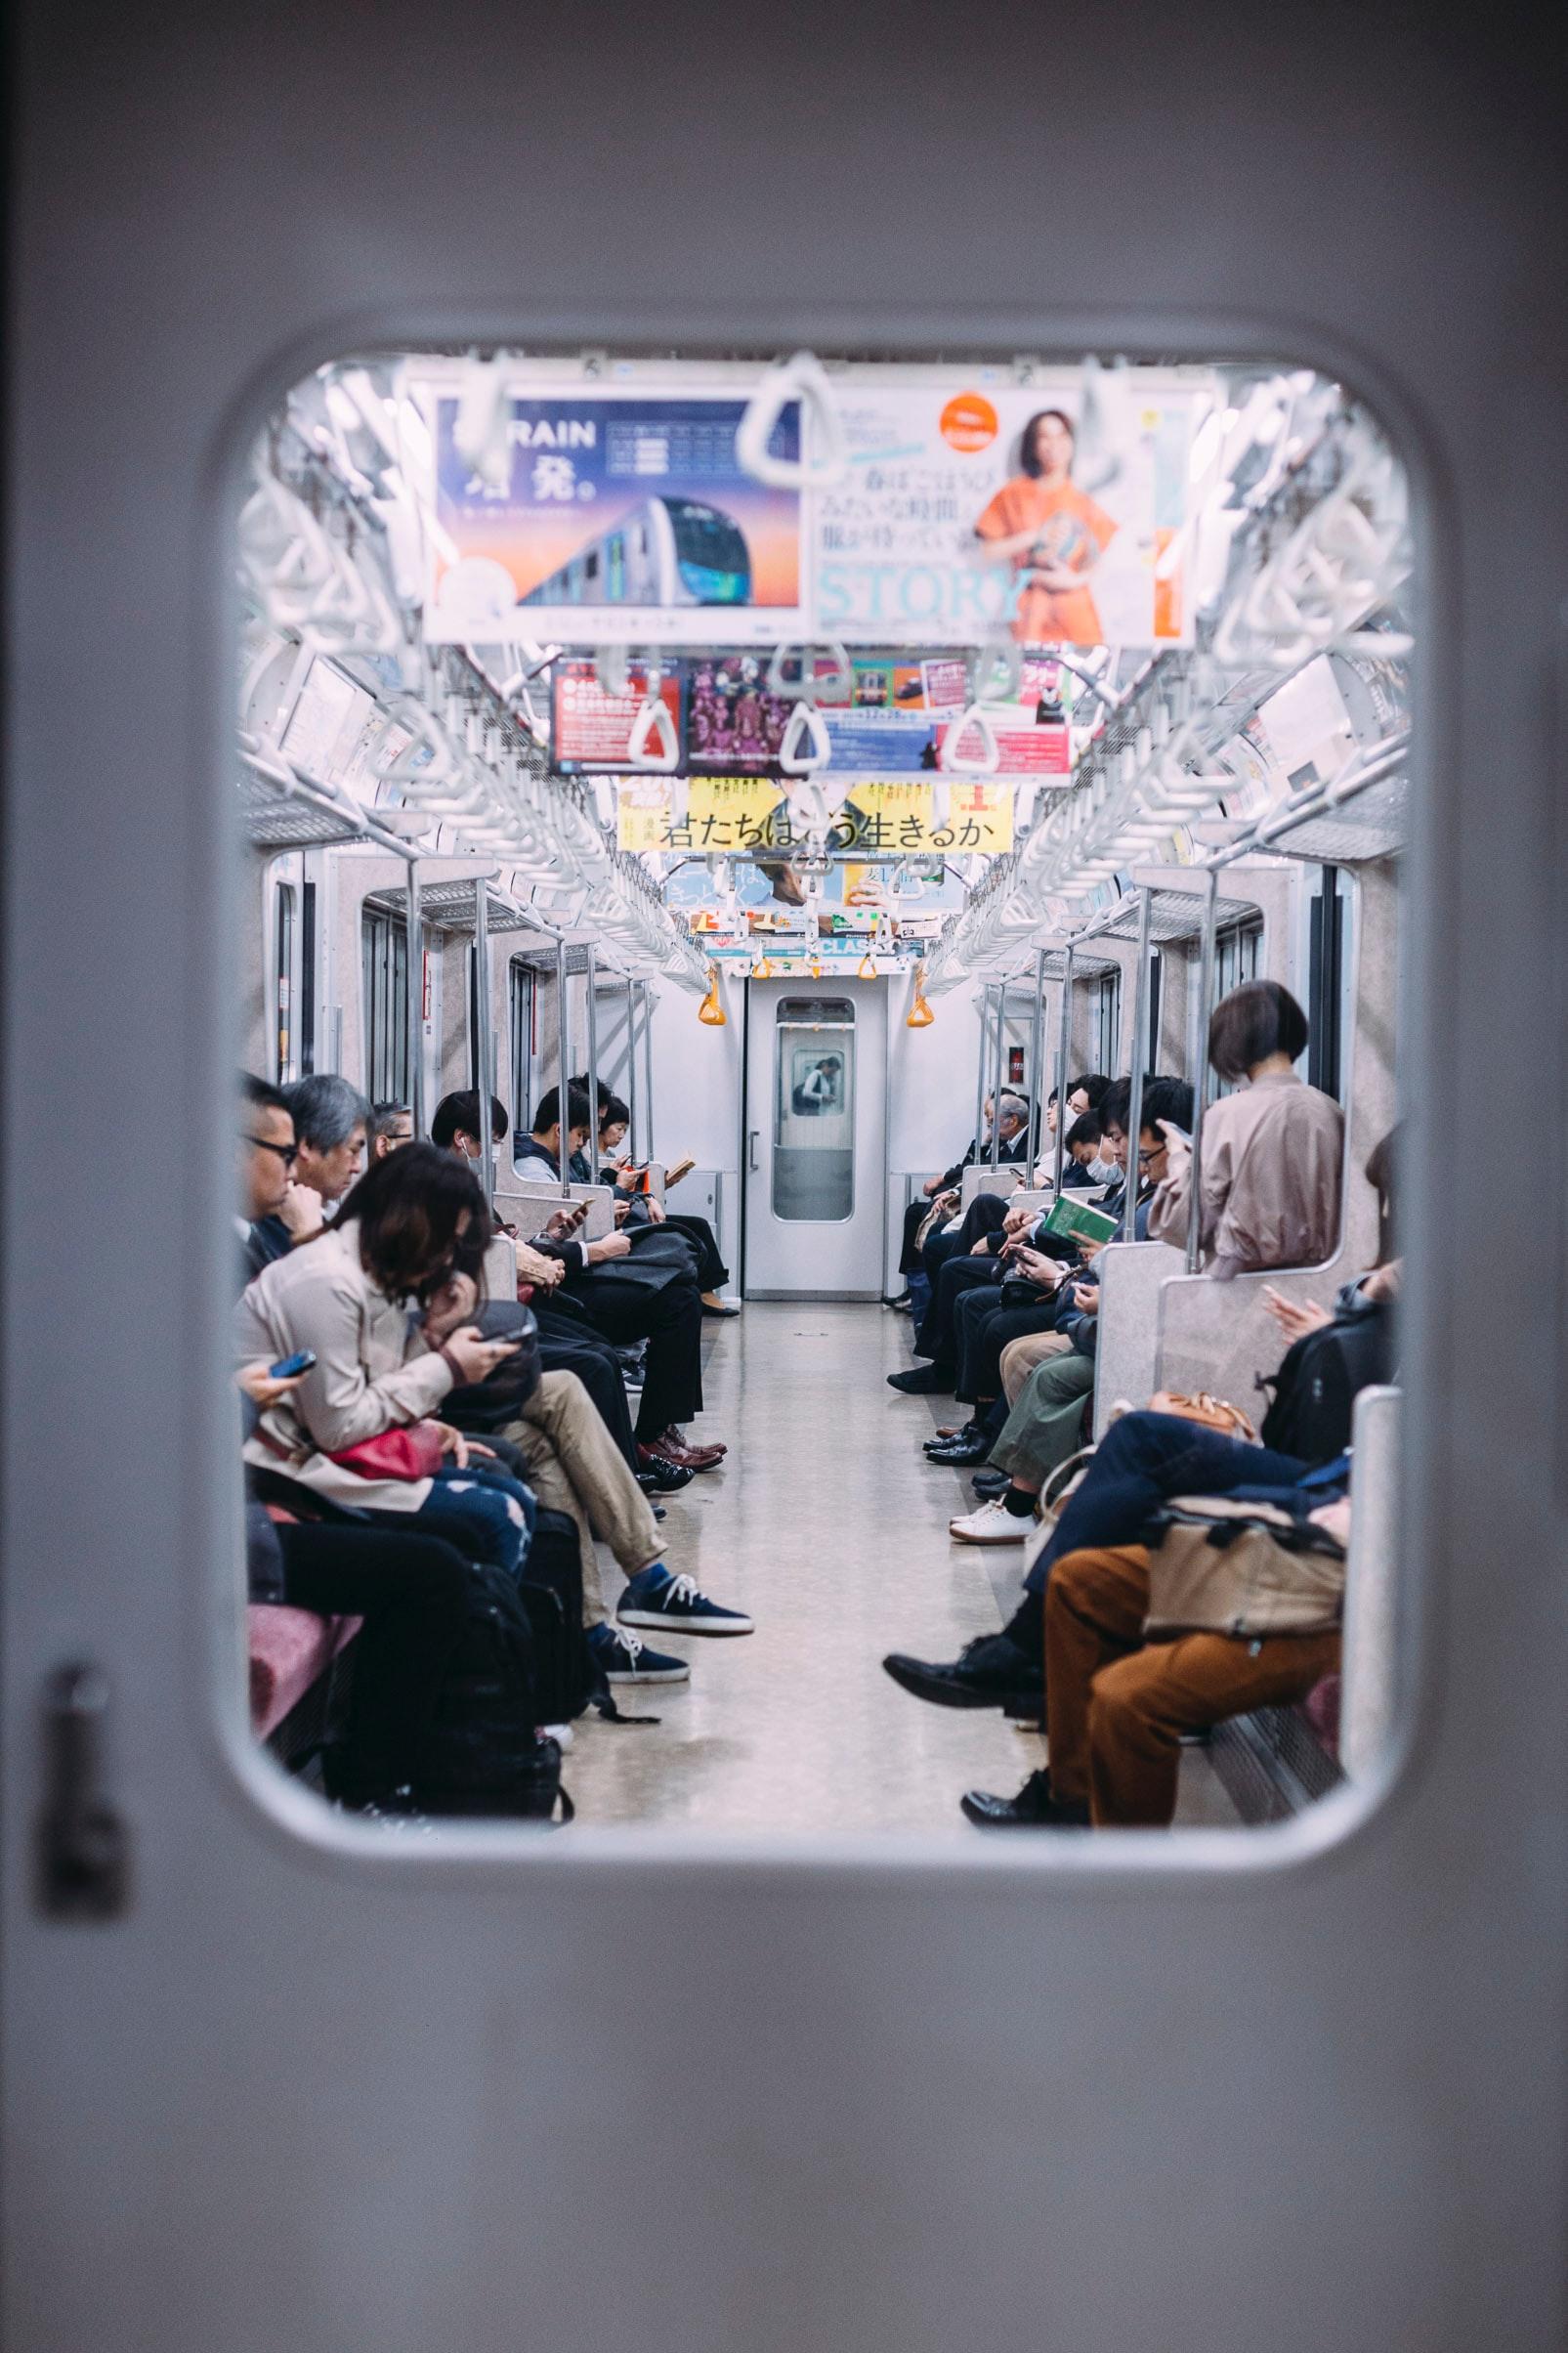 liam-burnett-blue--Tokyo Japan subway interior with commuters-unsplash